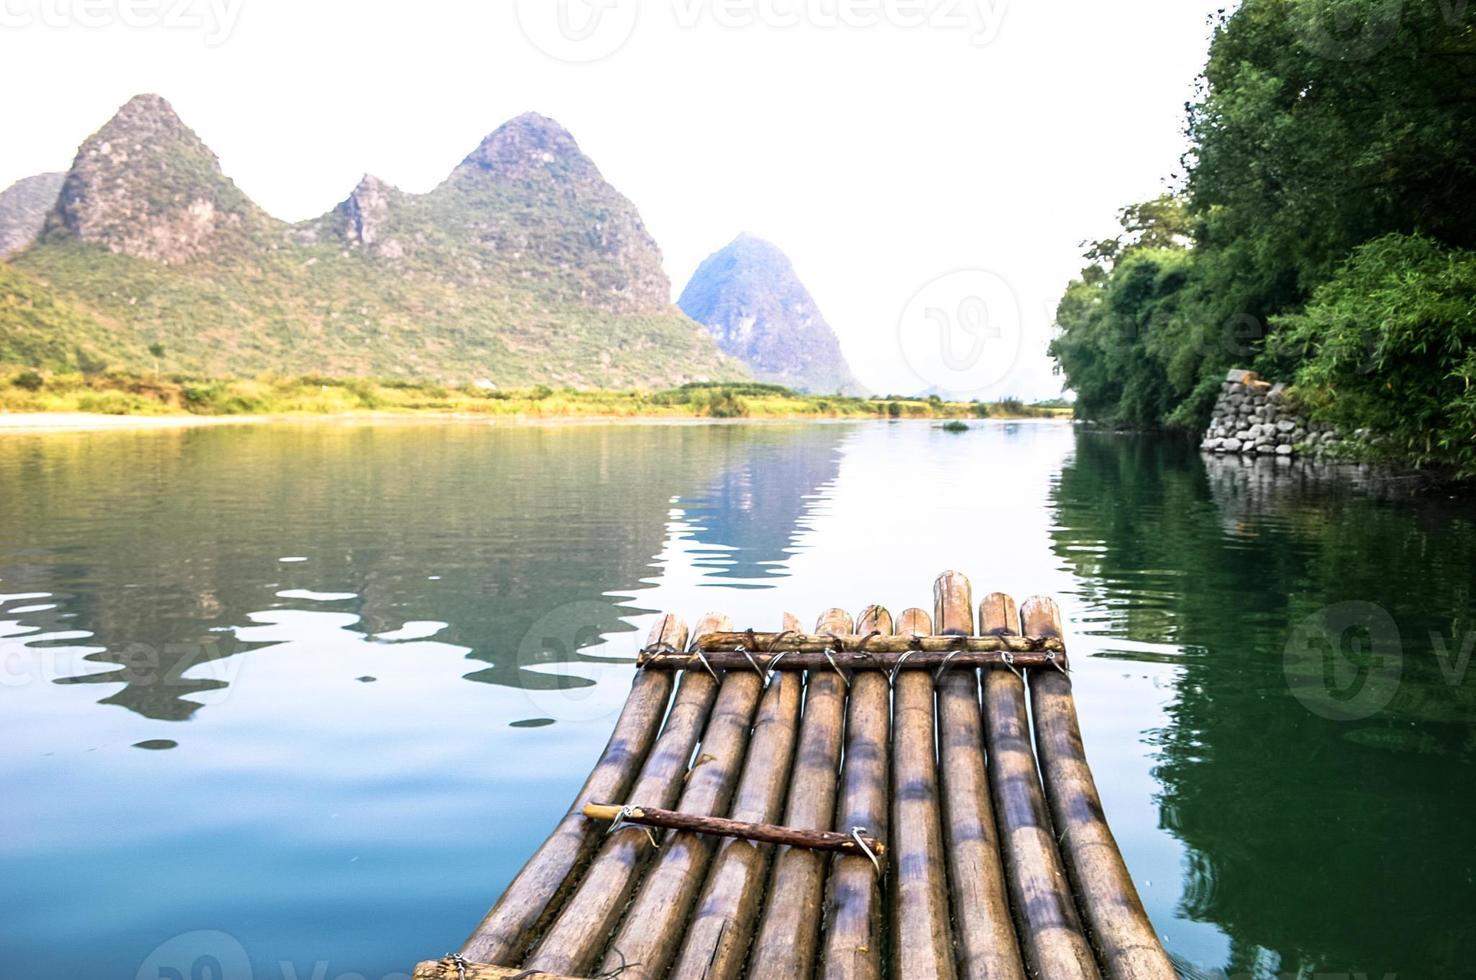 yangshuo nära Guilin, Kina foto